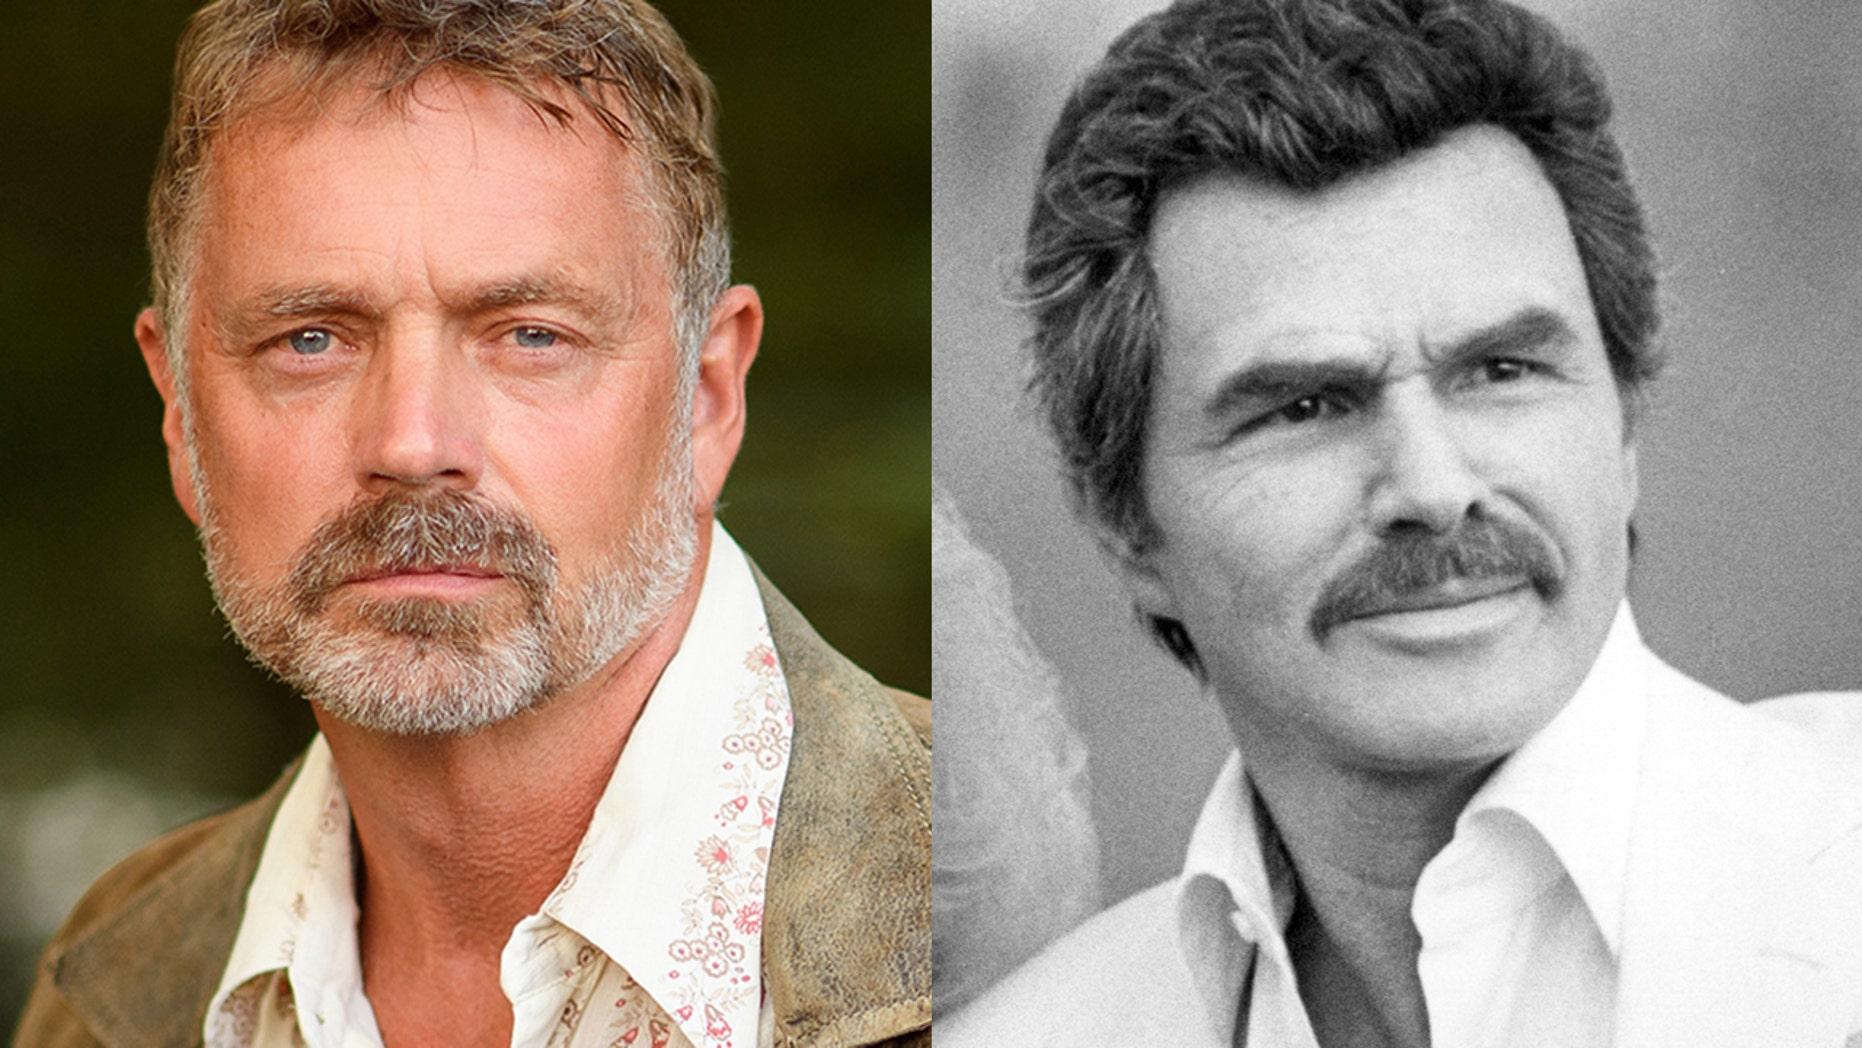 John Schneider recalled his friend, the late Burt Reynolds, in a touching post.